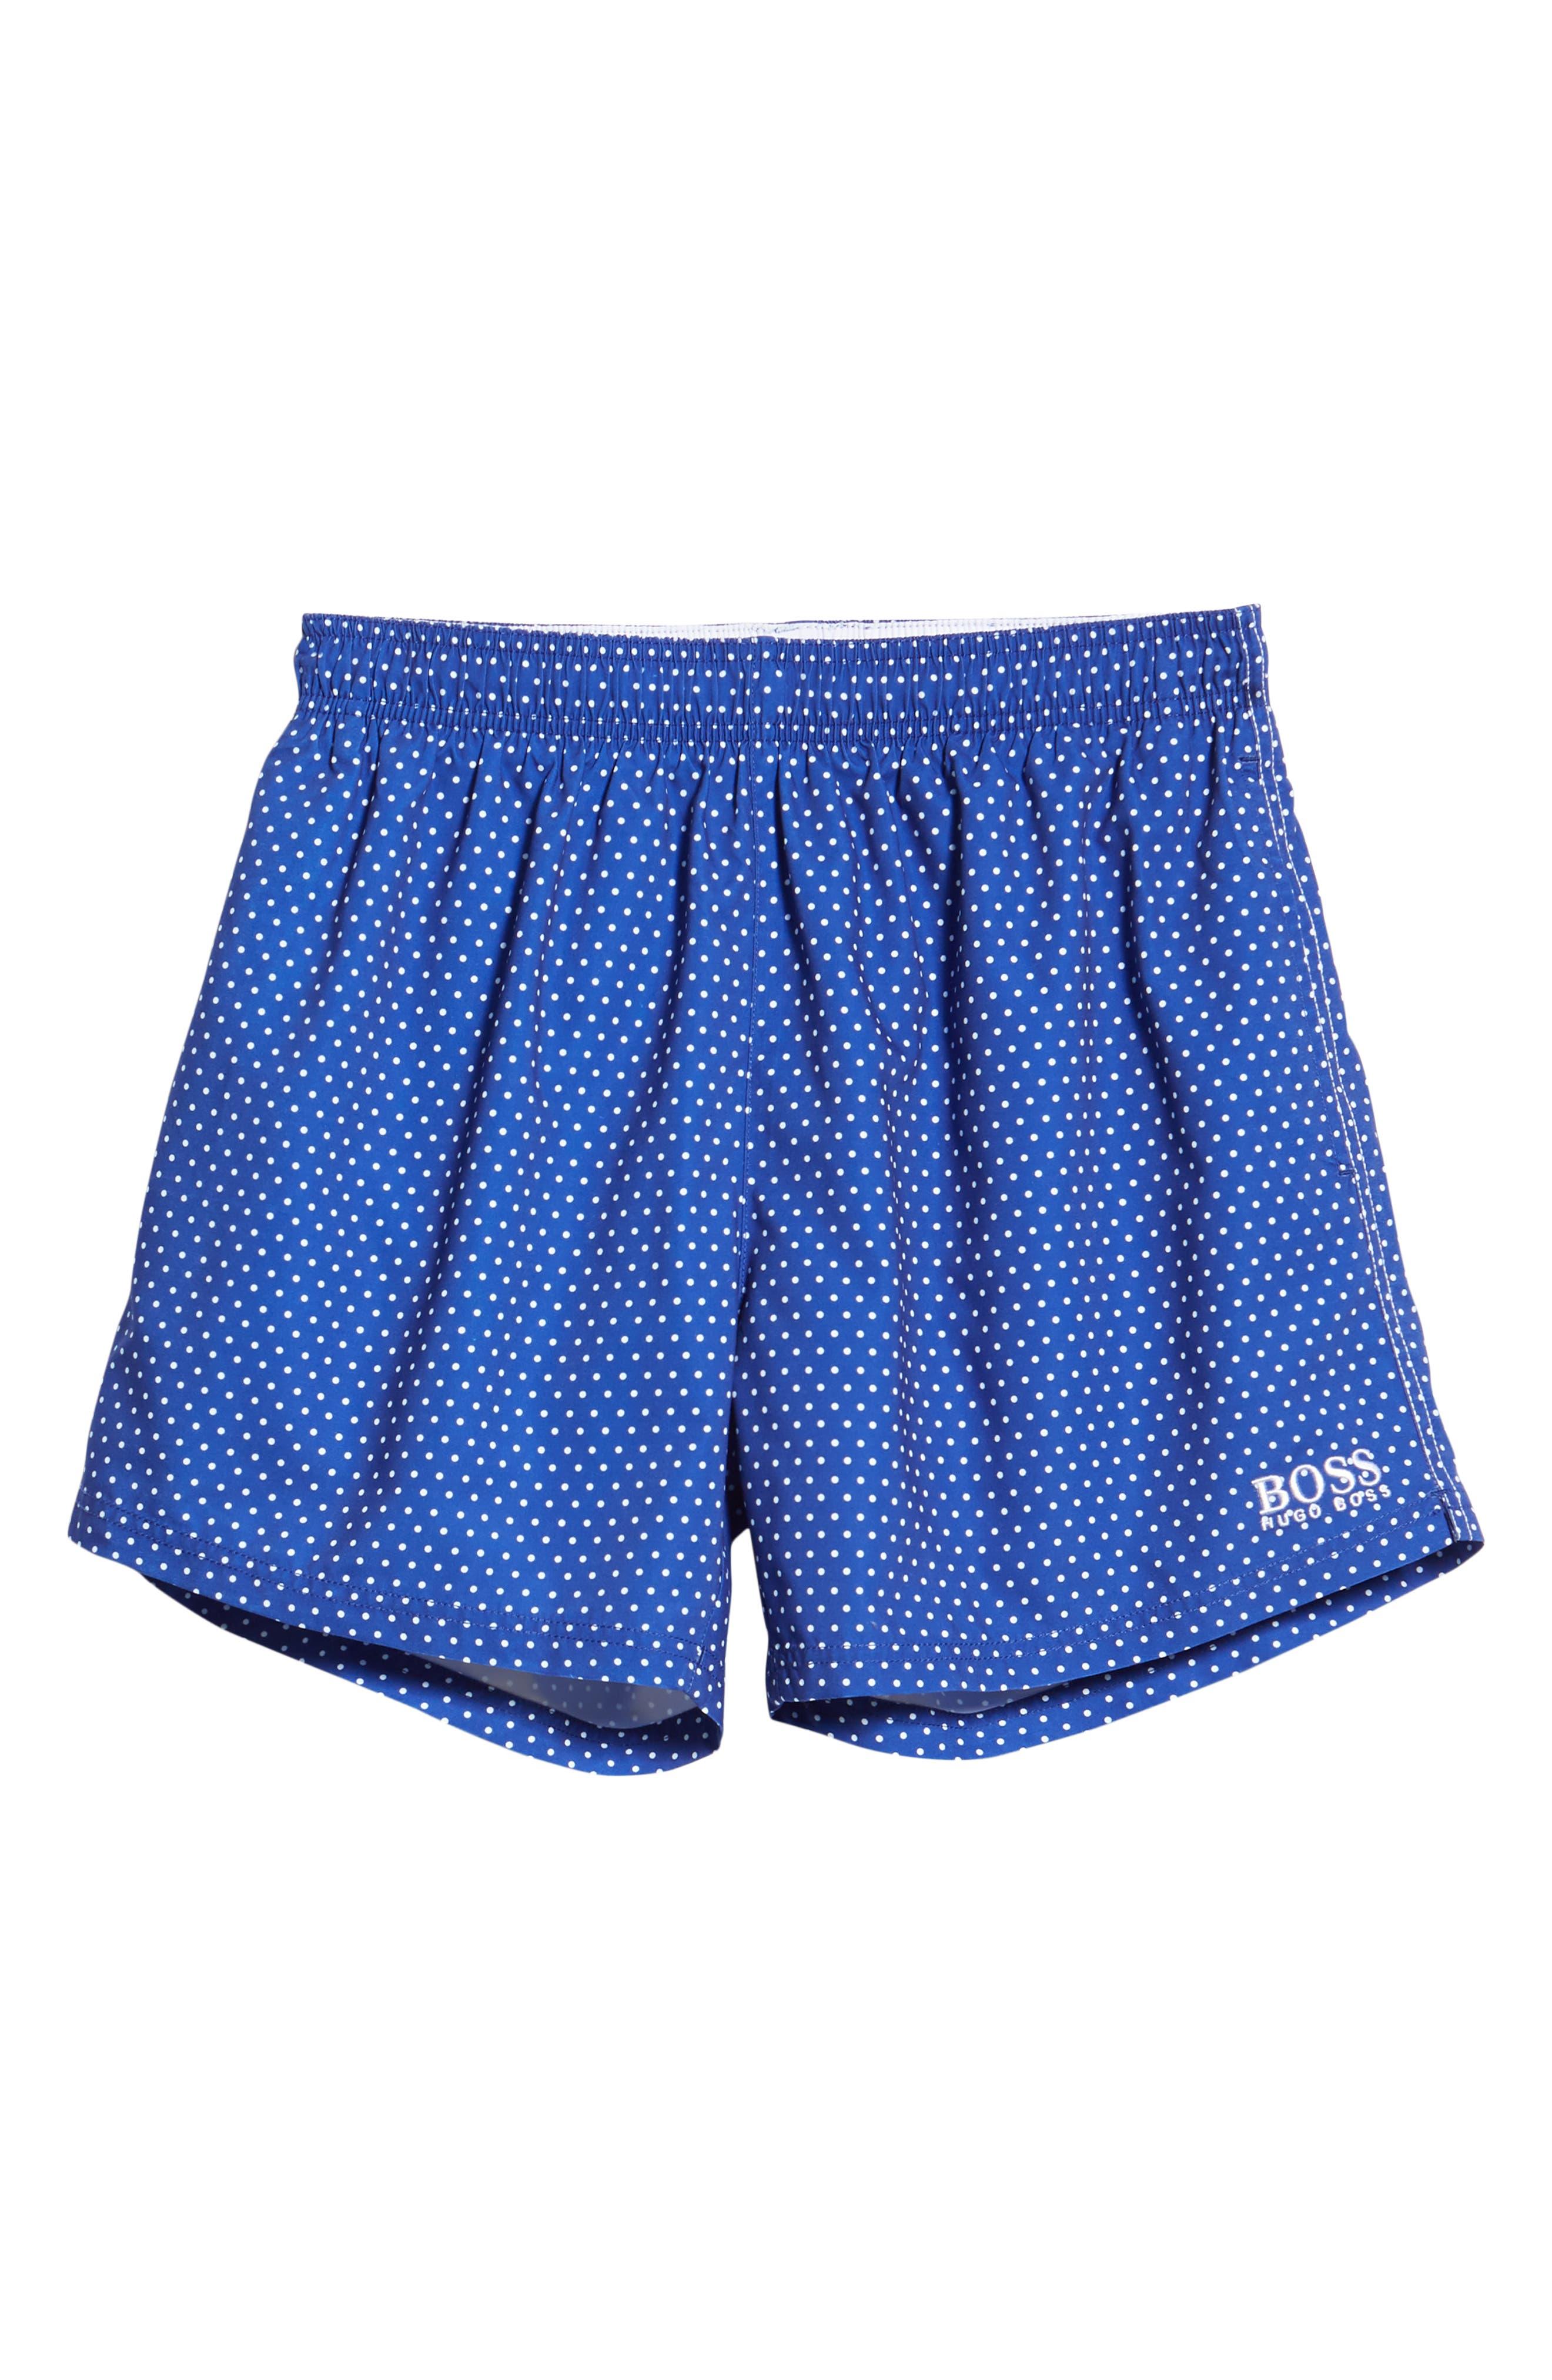 BOSS, Pike Regular Fit Polka Dot Swim Shorts, Alternate thumbnail 6, color, BLUE